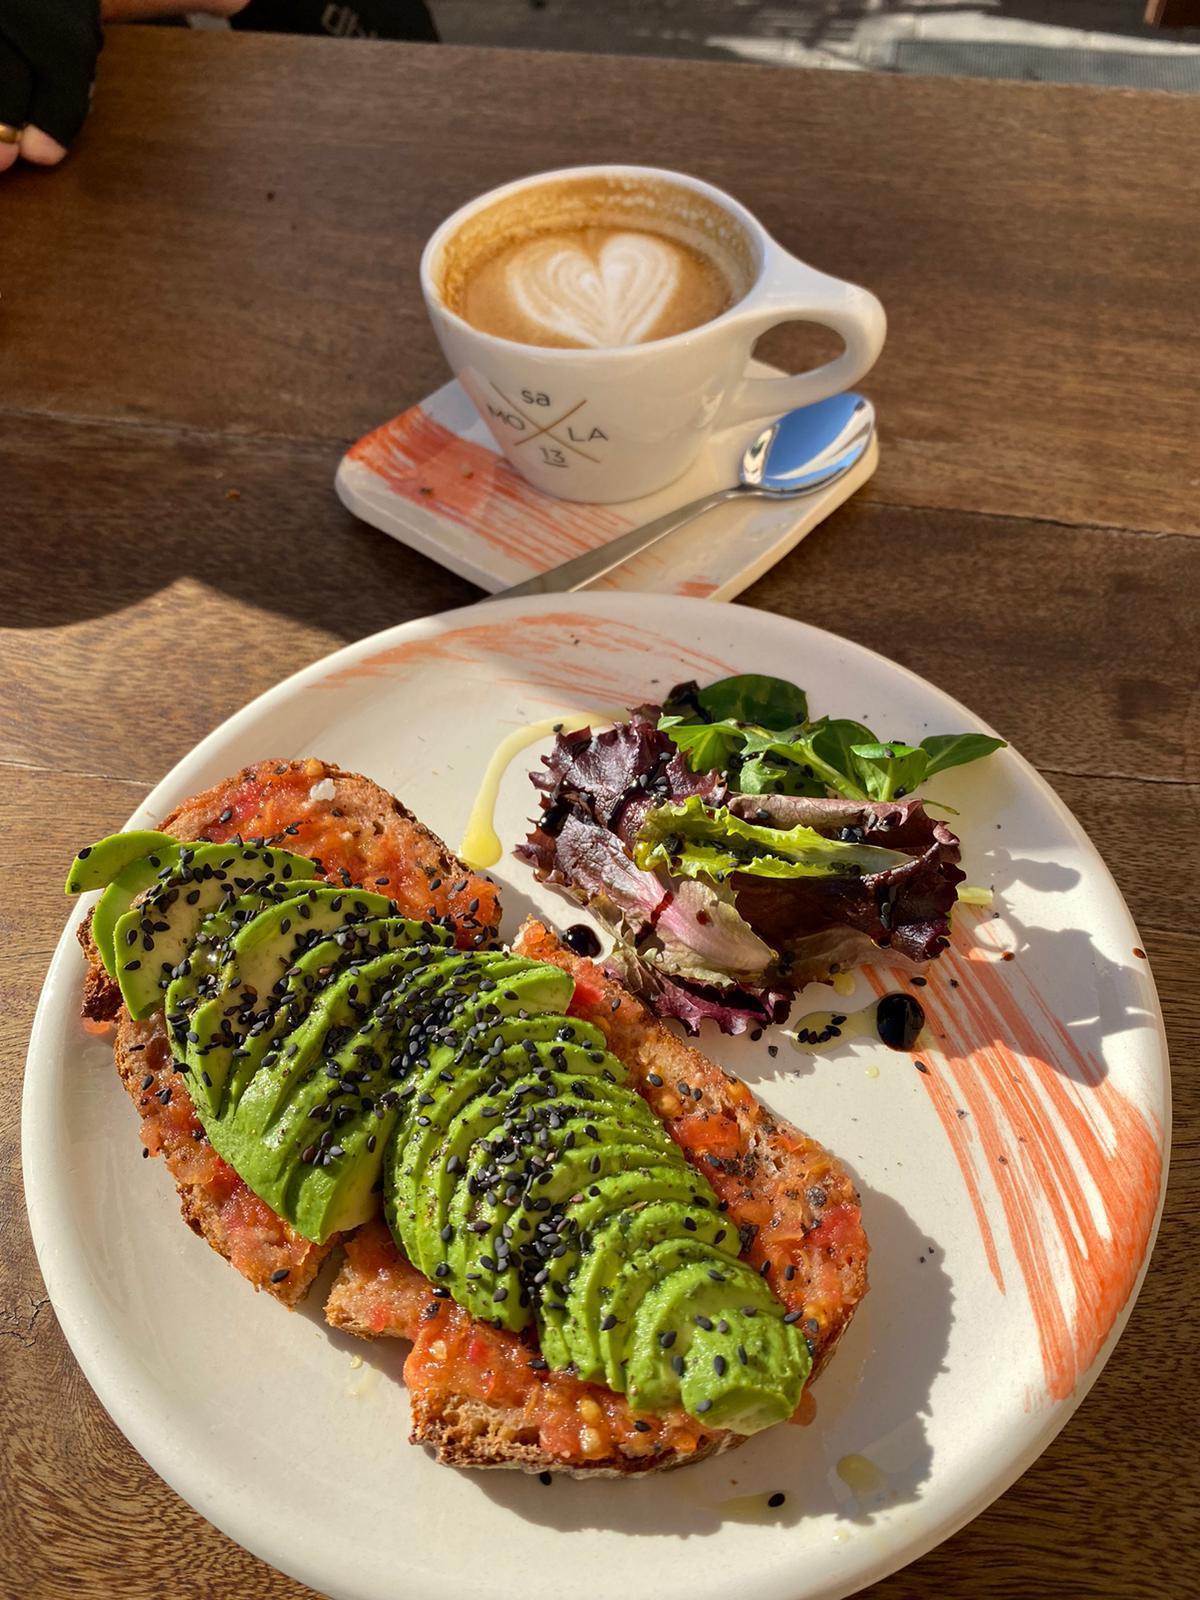 Otties Top 7 Café stops